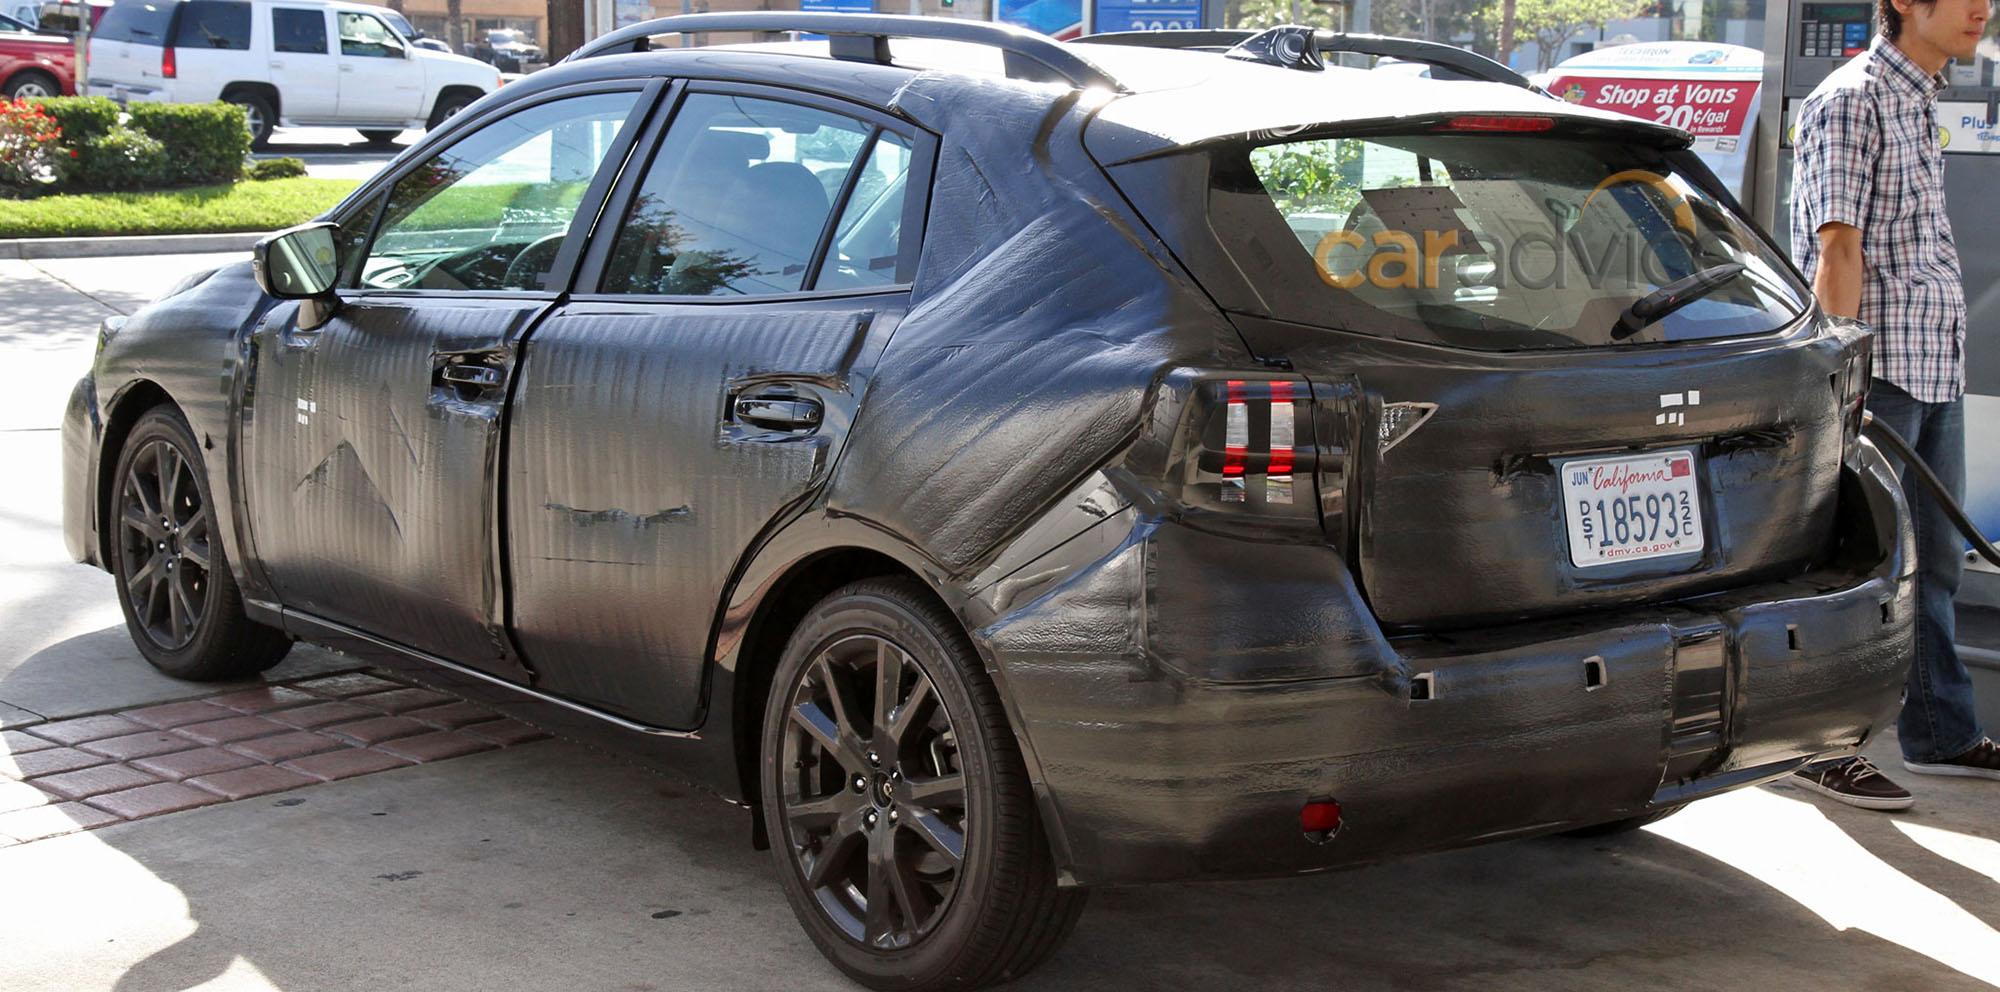 2016 Subaru Impreza Interior And Exterior Spy Photos Photos 1 Of 4